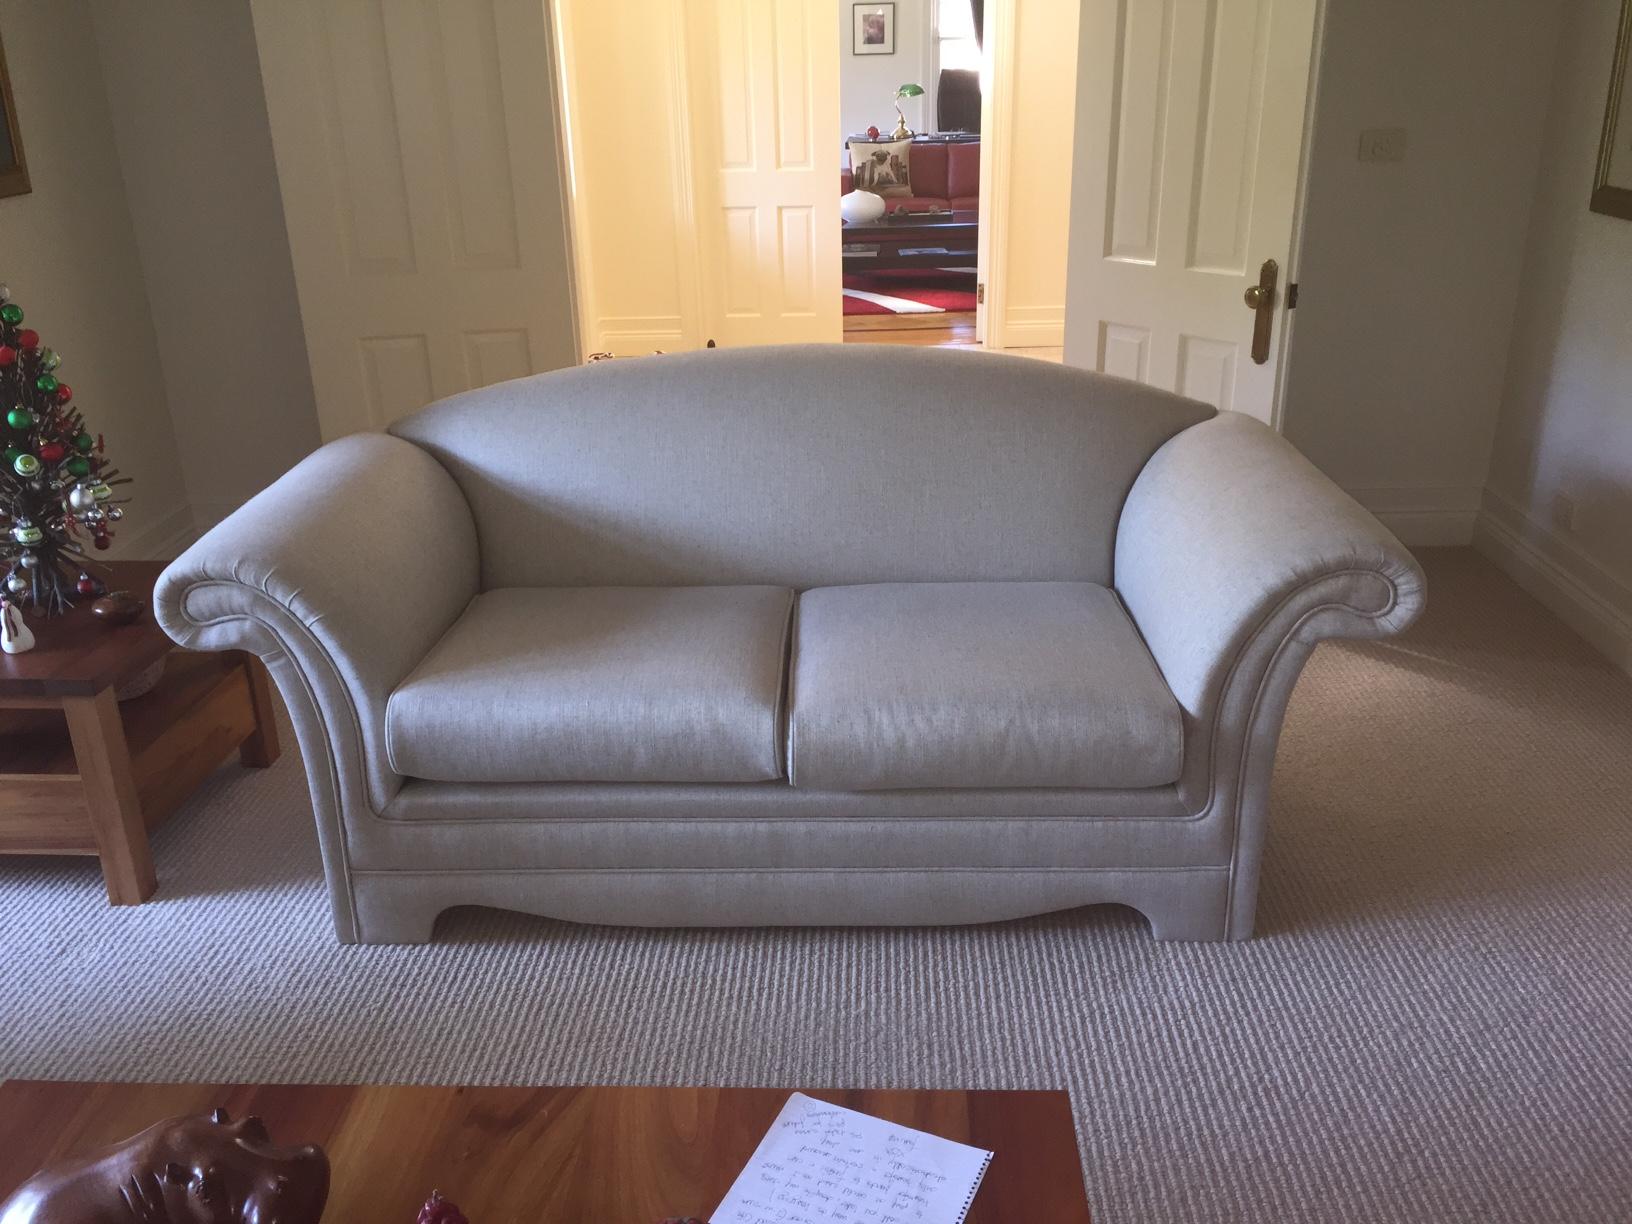 sofa reupholstered 3-4 weeks